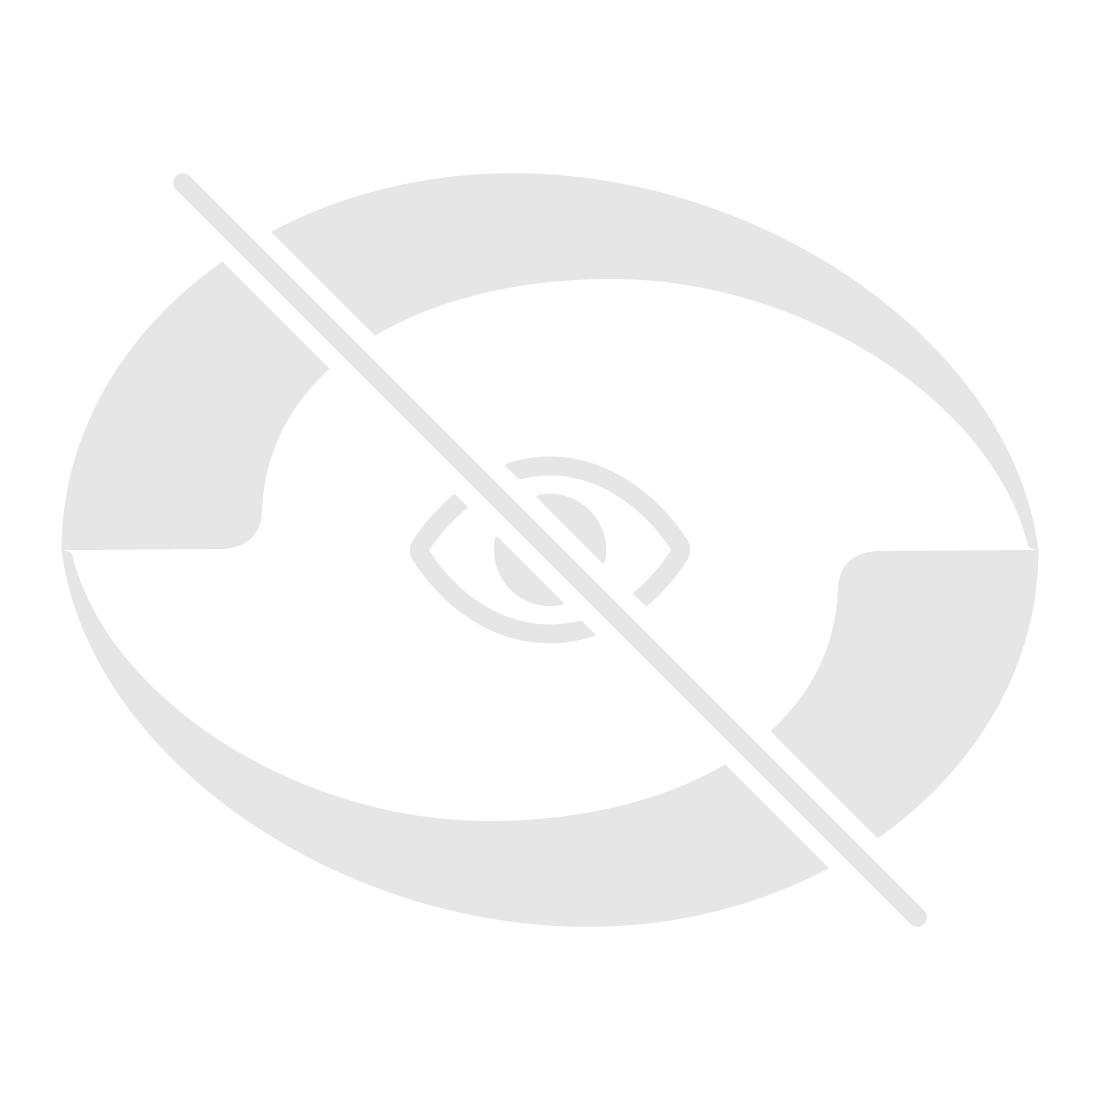 GeoVision GV-800B-08 • 8 channel hybrid video capture card